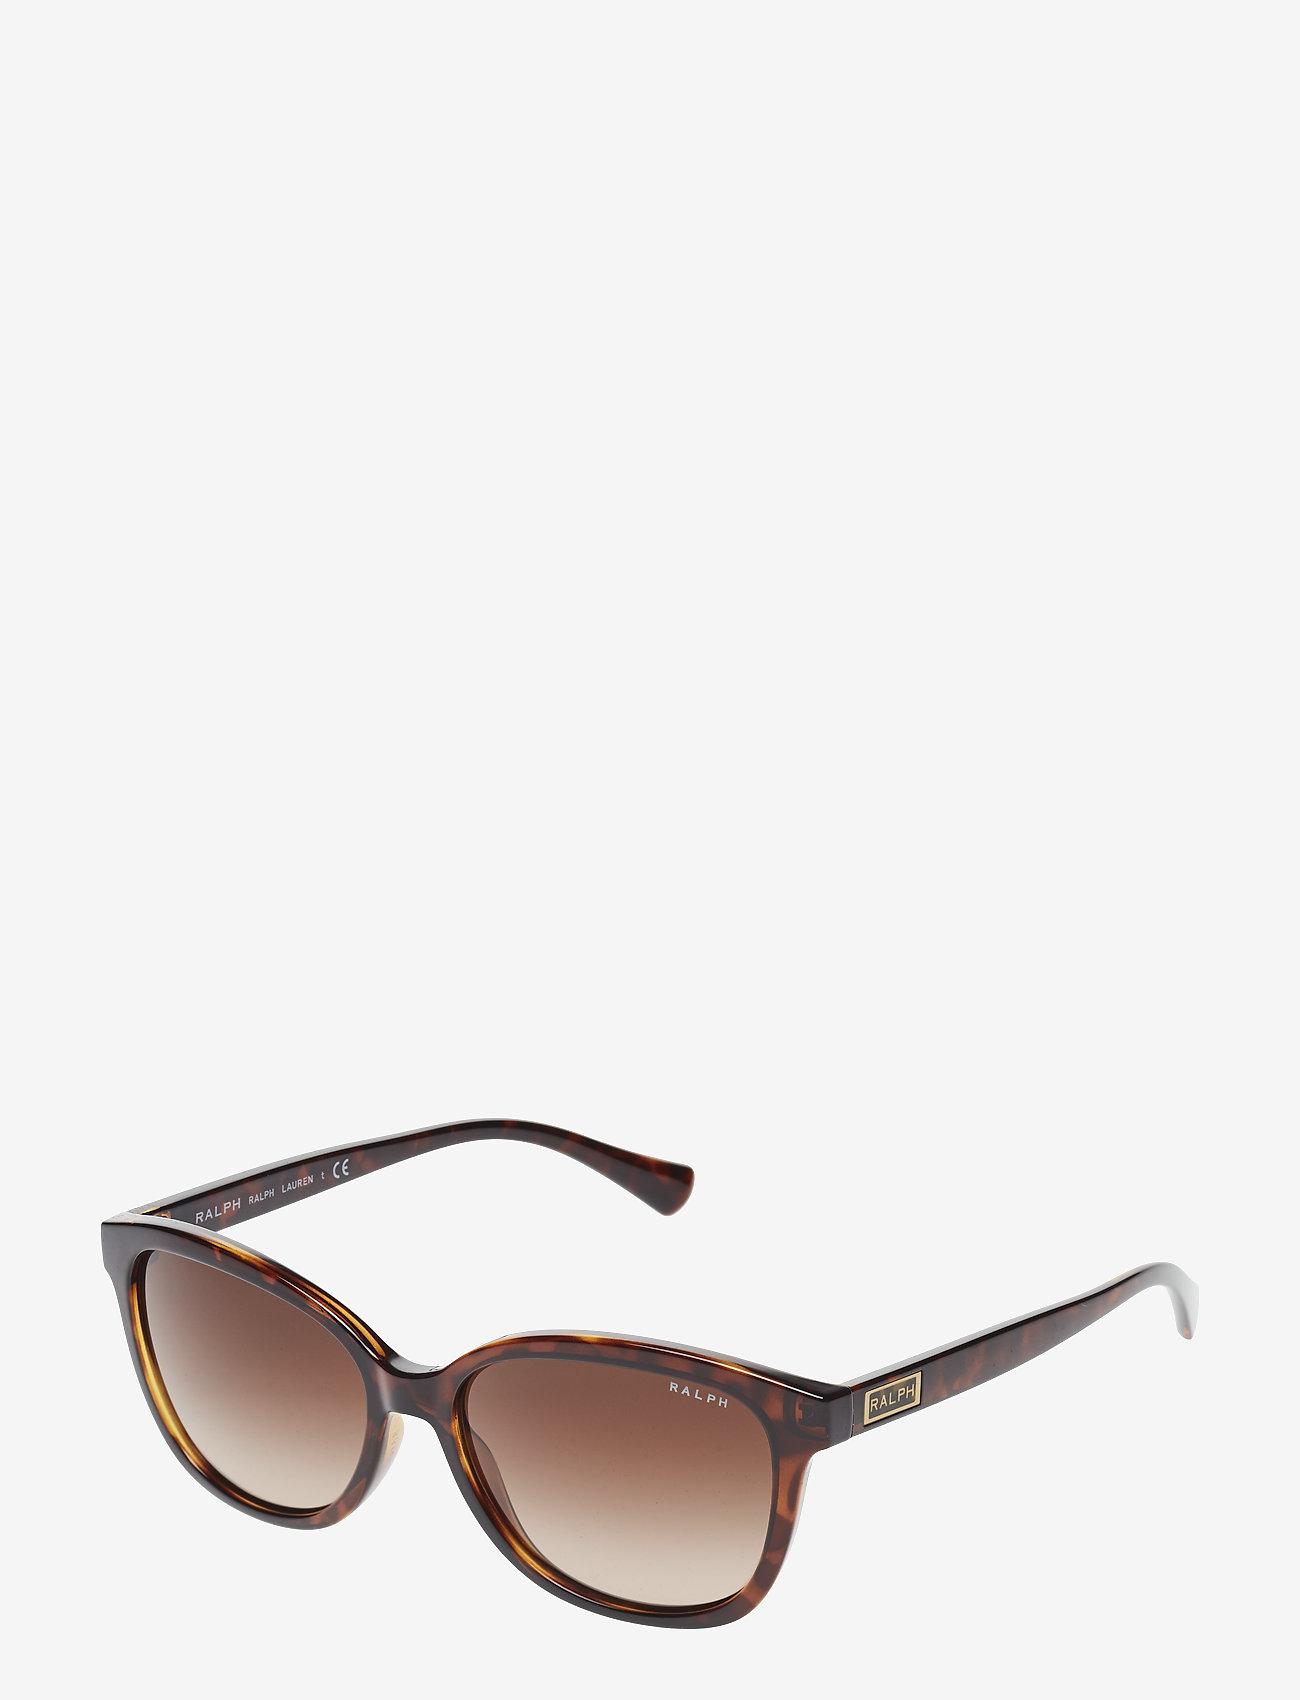 Ralph Ralph Lauren Sunglasses - 0RA5222 - wayfarer - dark tortoise - 1